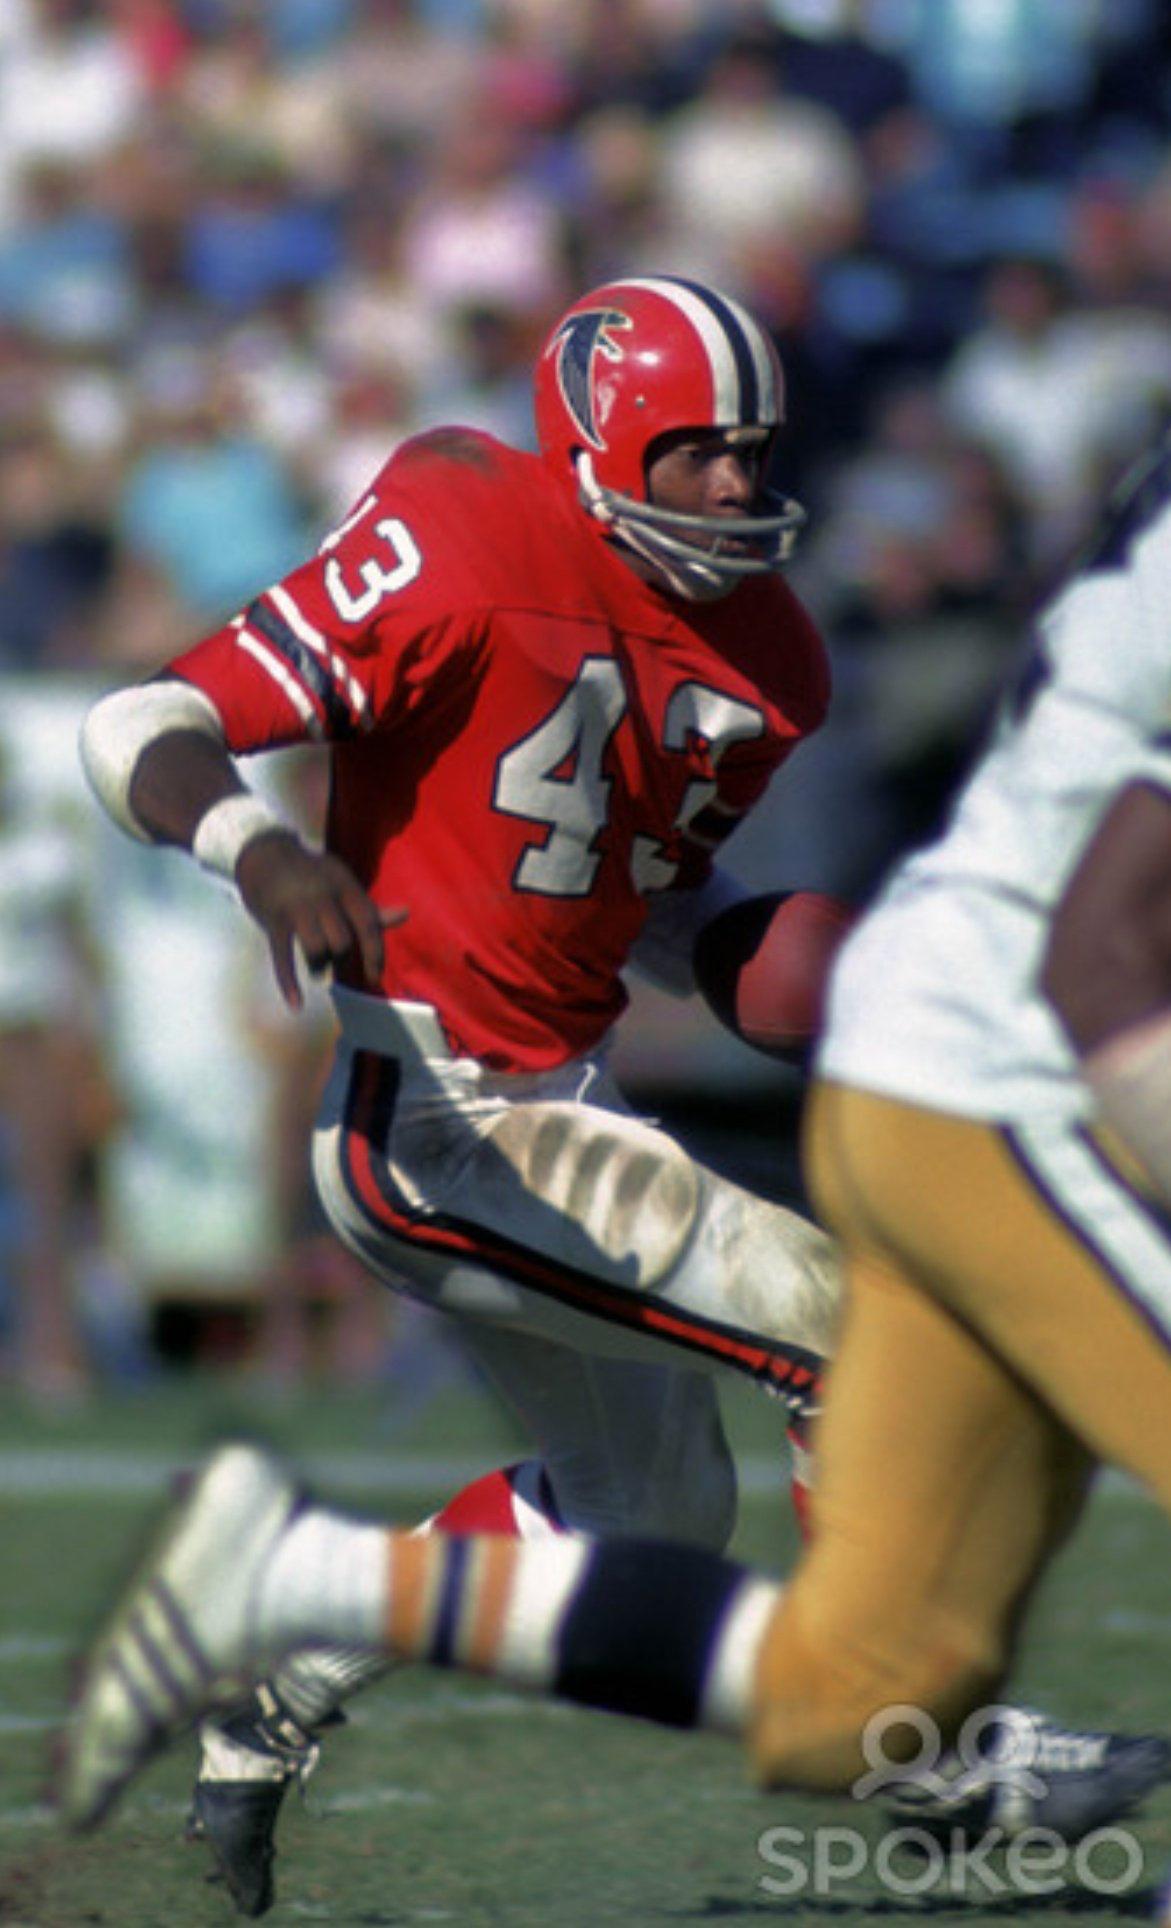 Dave Hampton Atlanta Falcons Football Images Nfl Football Players Nfl Uniforms